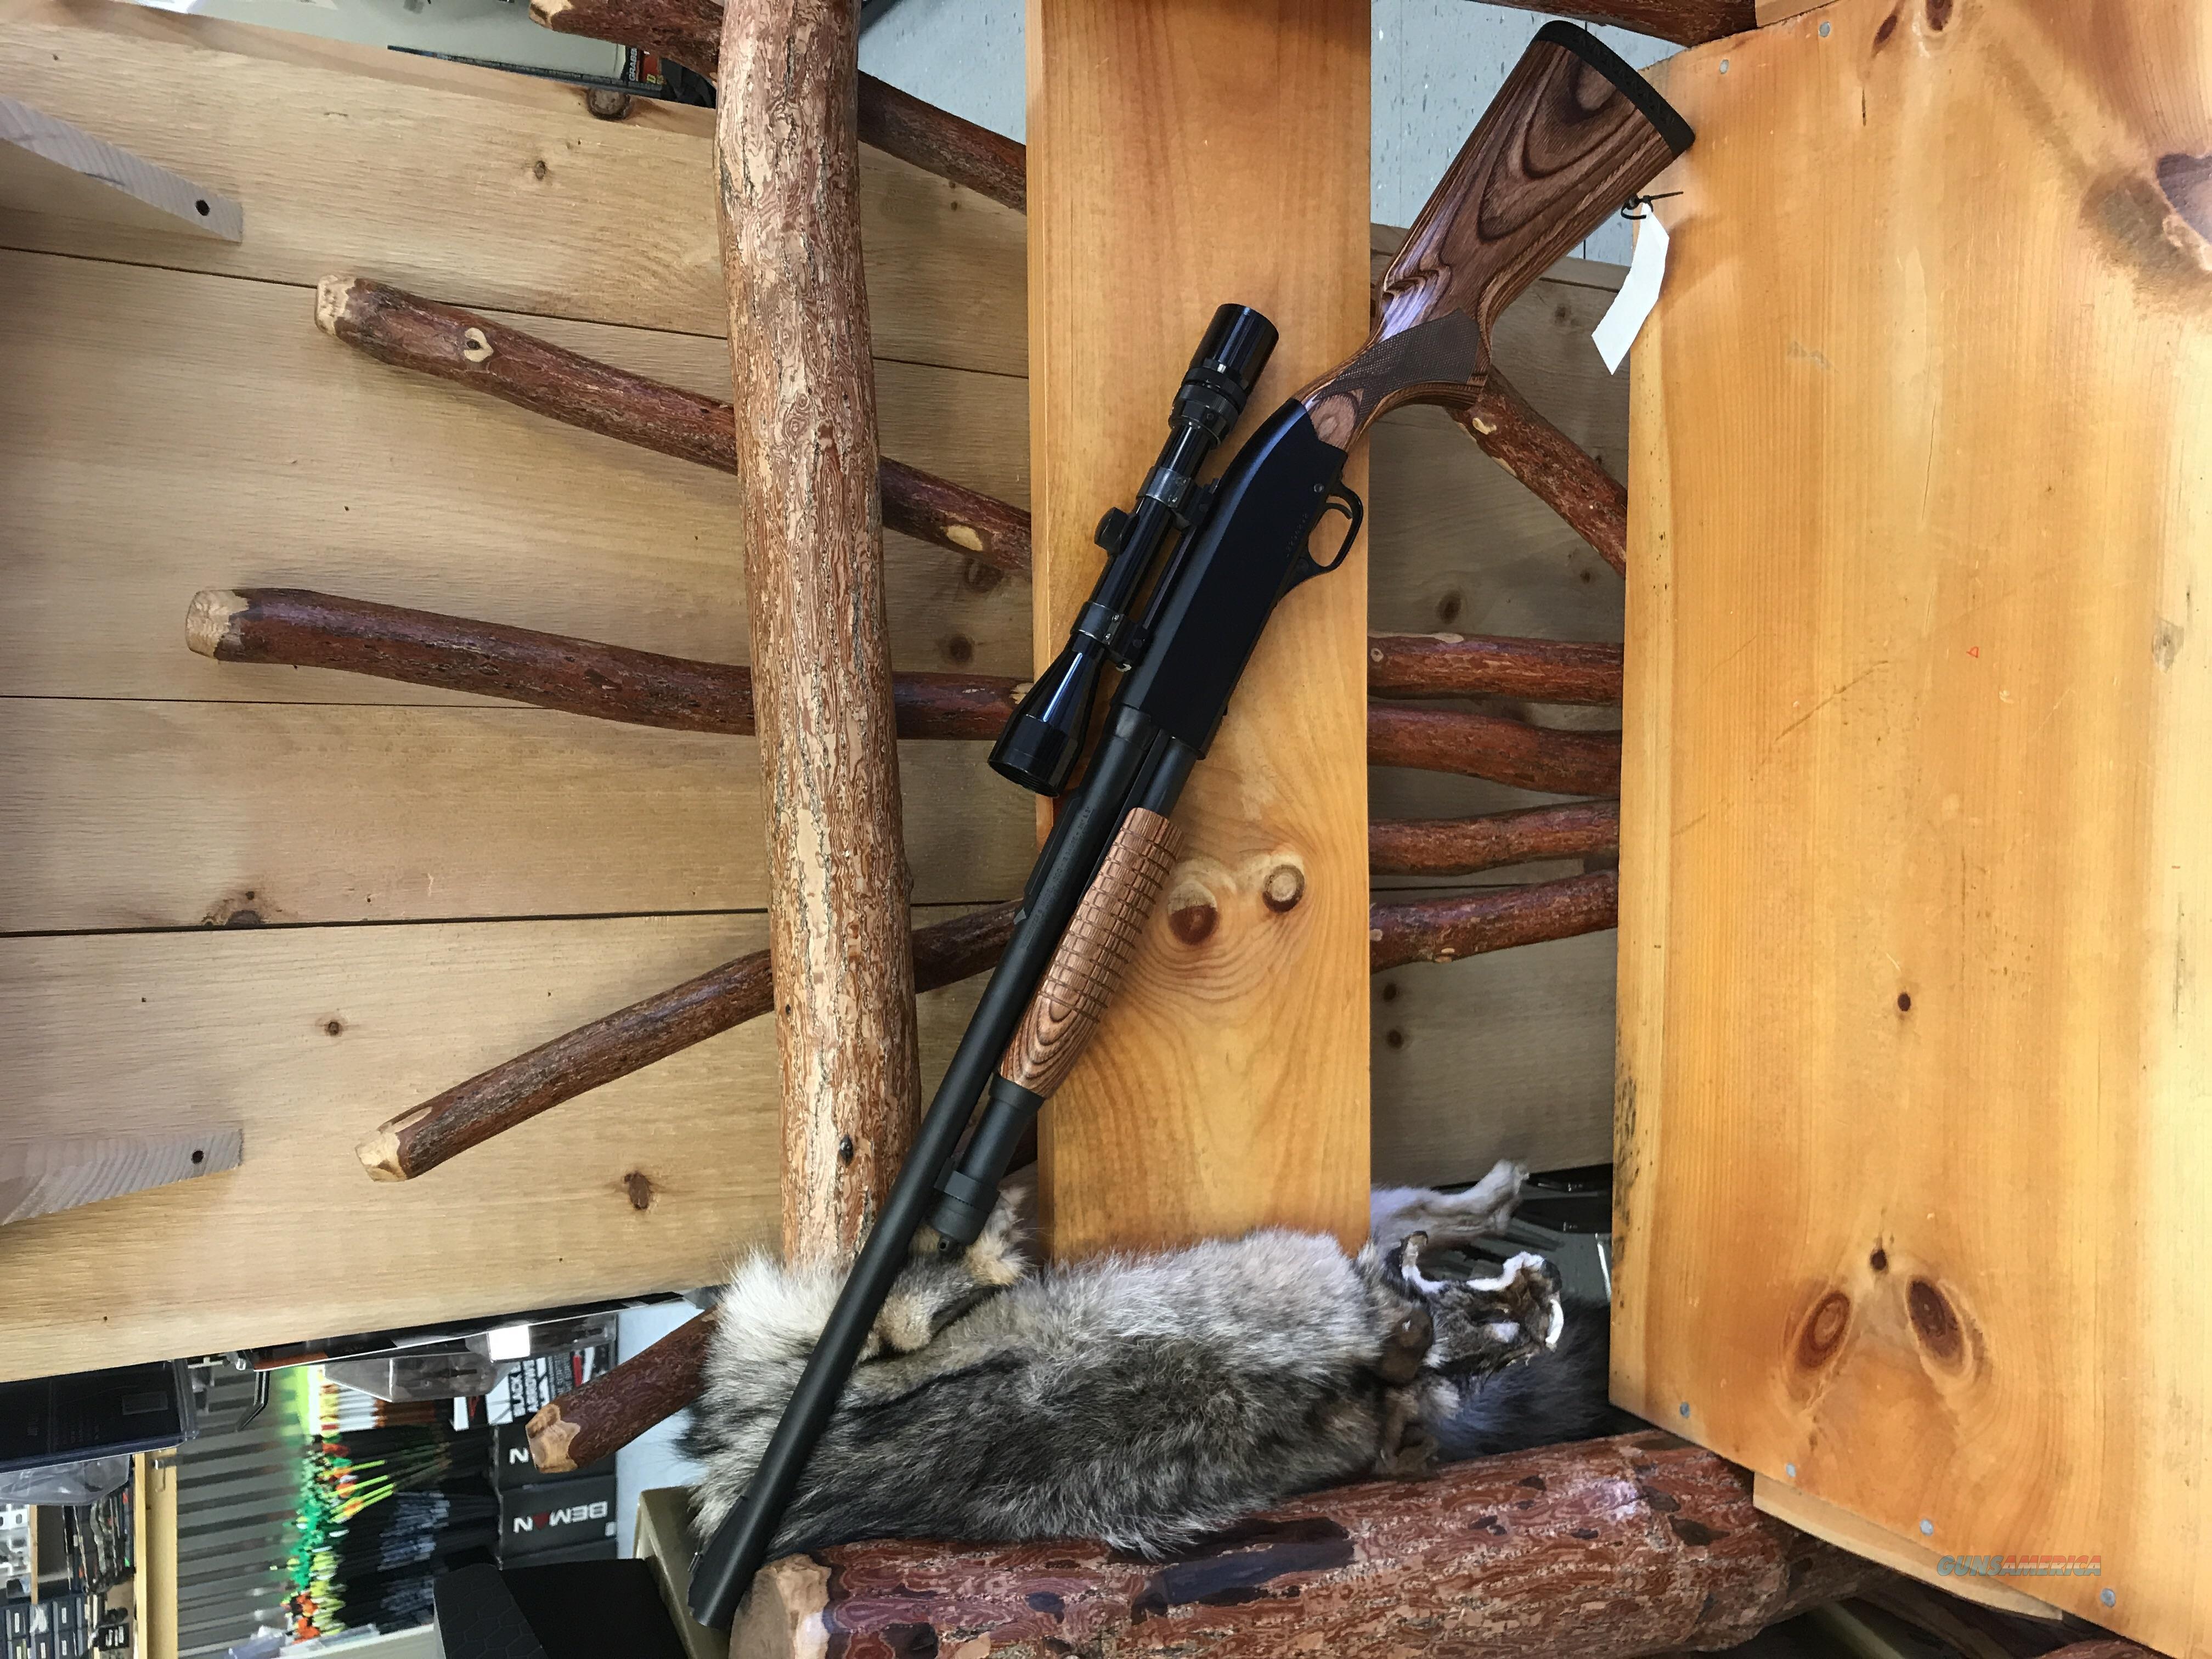 Winchester 1300 12gauge w/scope  Guns > Shotguns > Winchester Shotguns - Modern > Pump Action > Hunting